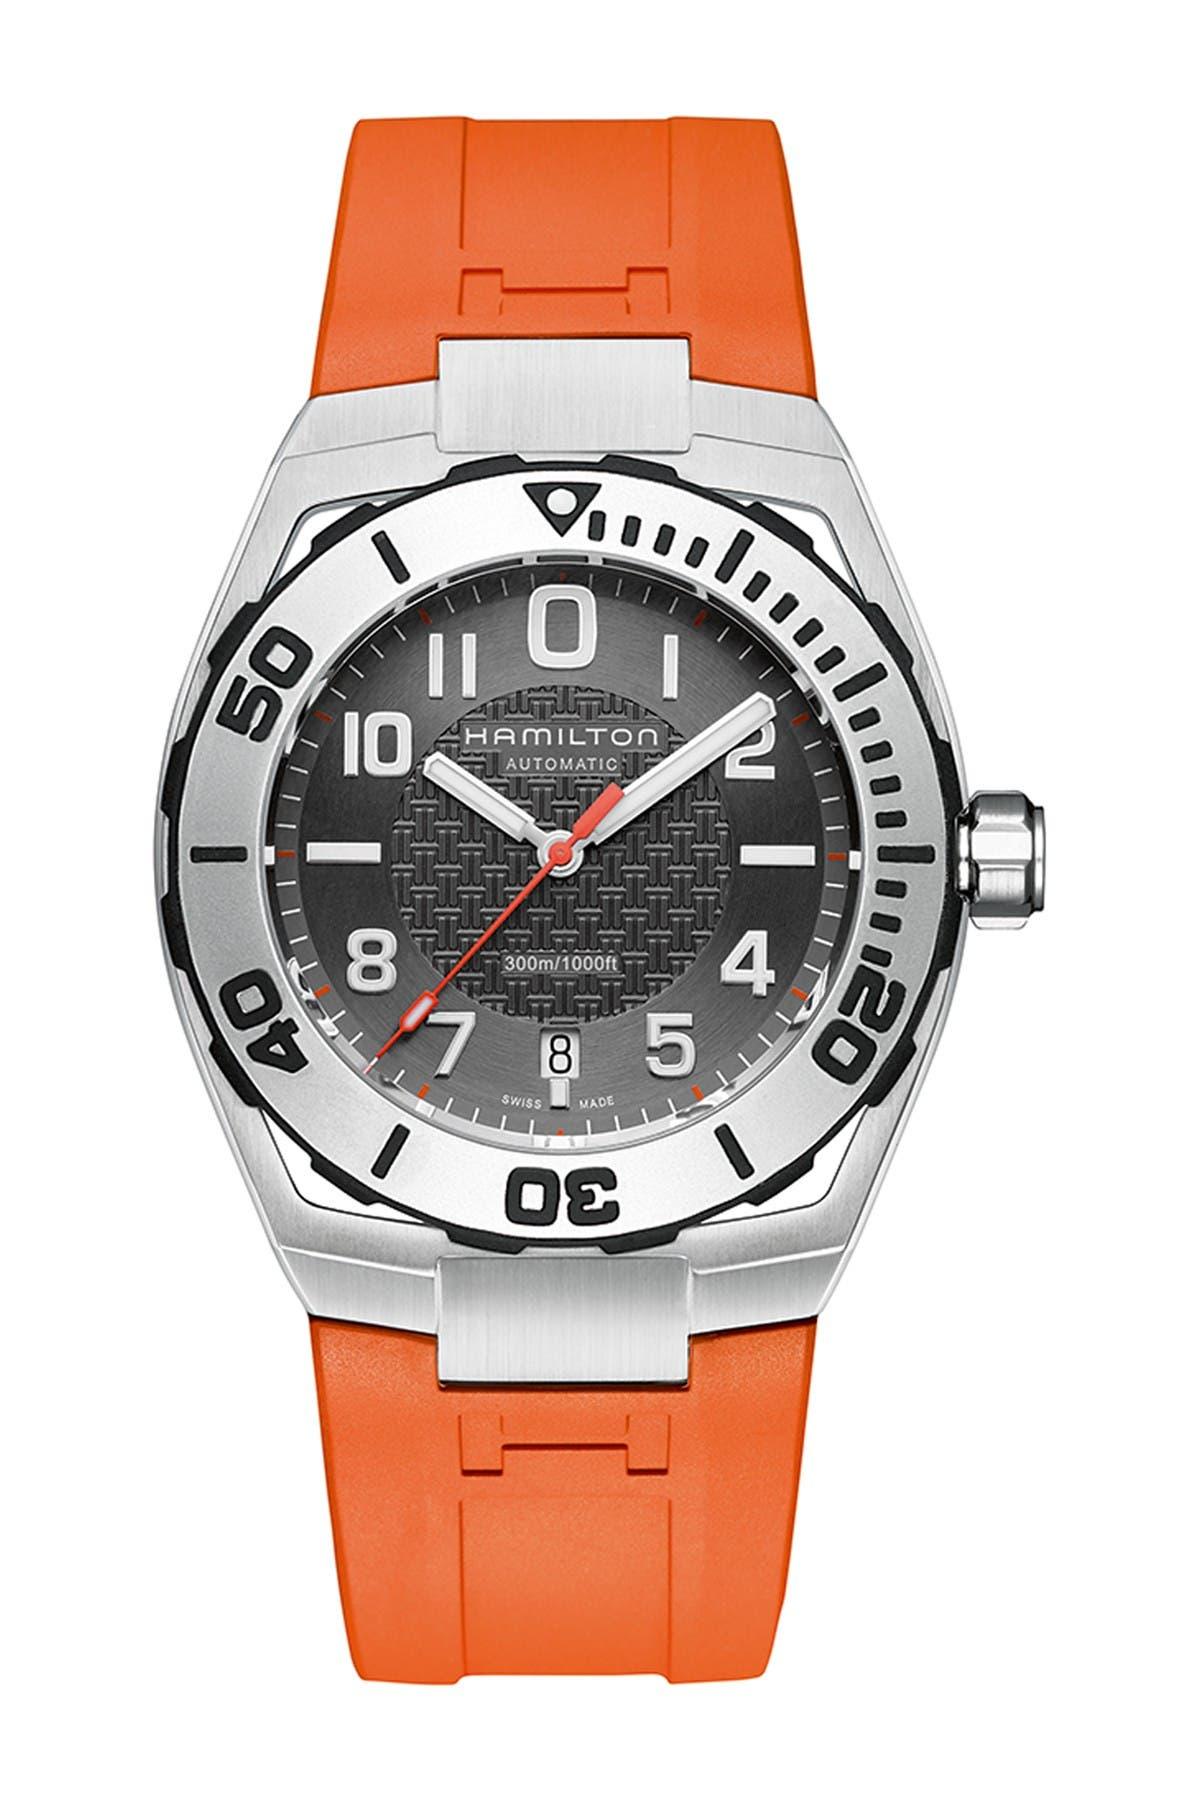 Image of Hamilton Men's Khaki Navy Rubber Watch, 42mm